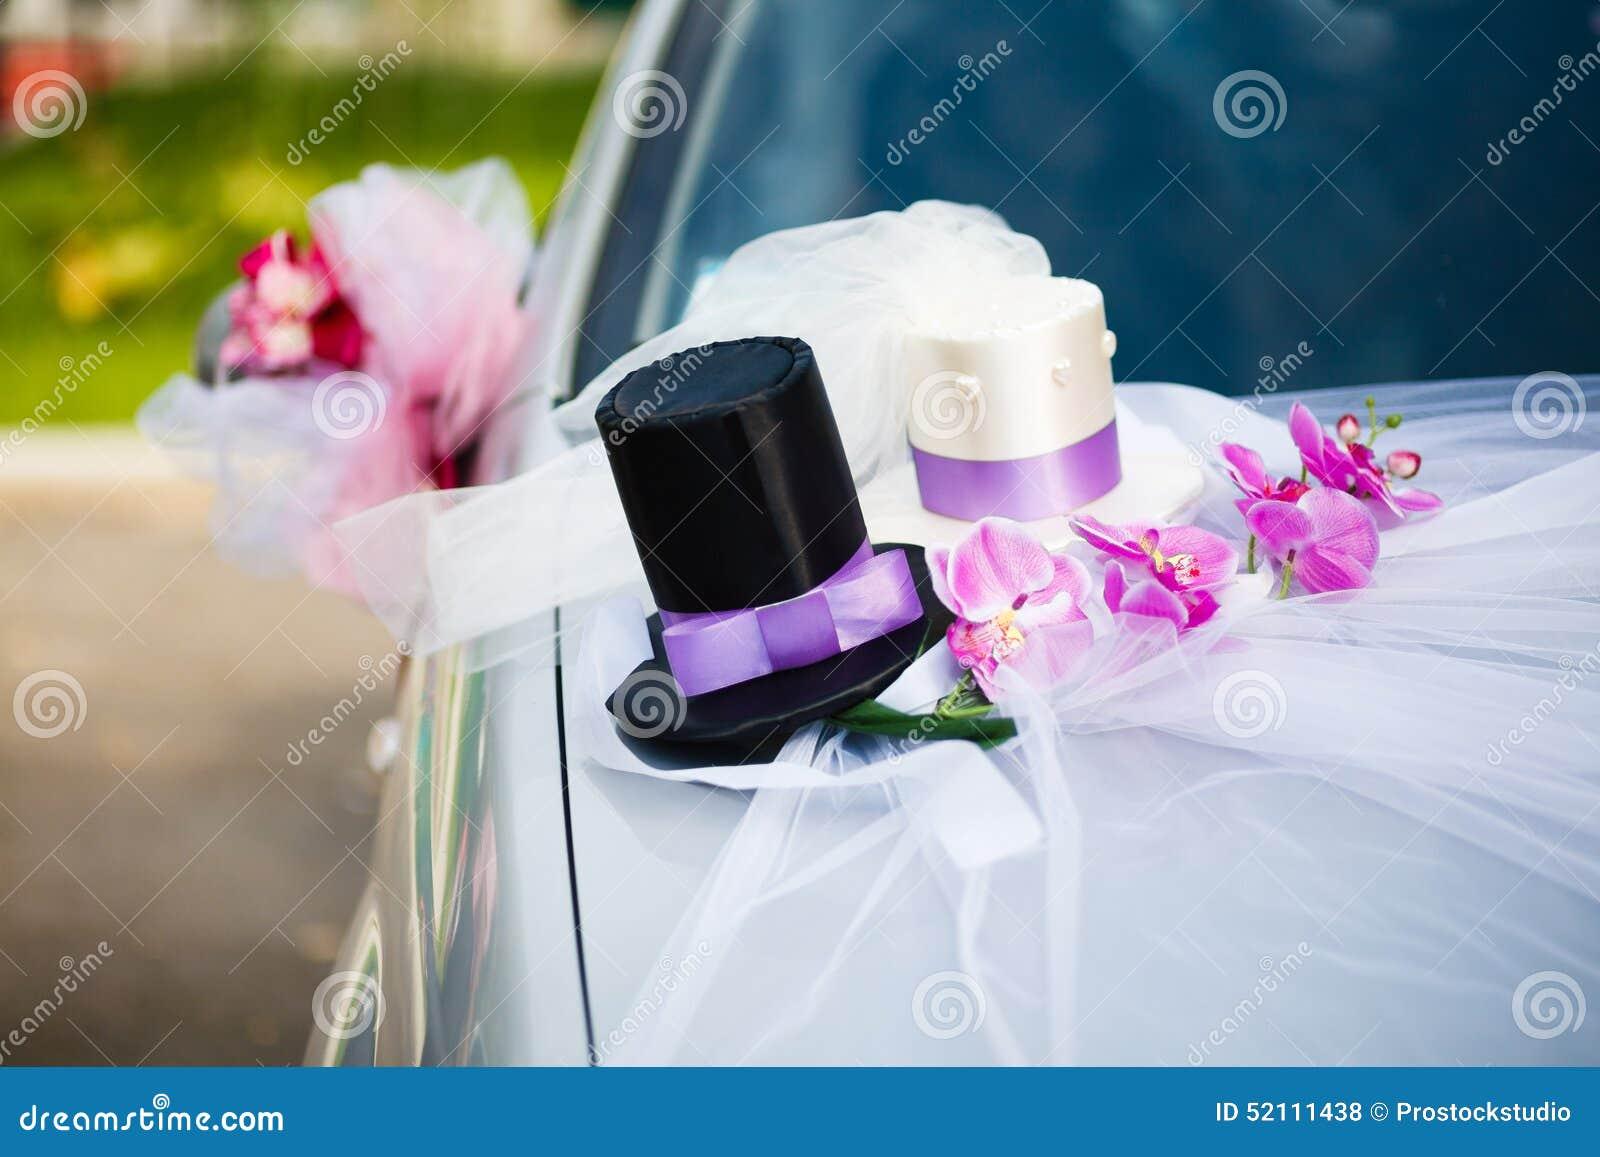 deco voiture mariage invite. Black Bedroom Furniture Sets. Home Design Ideas